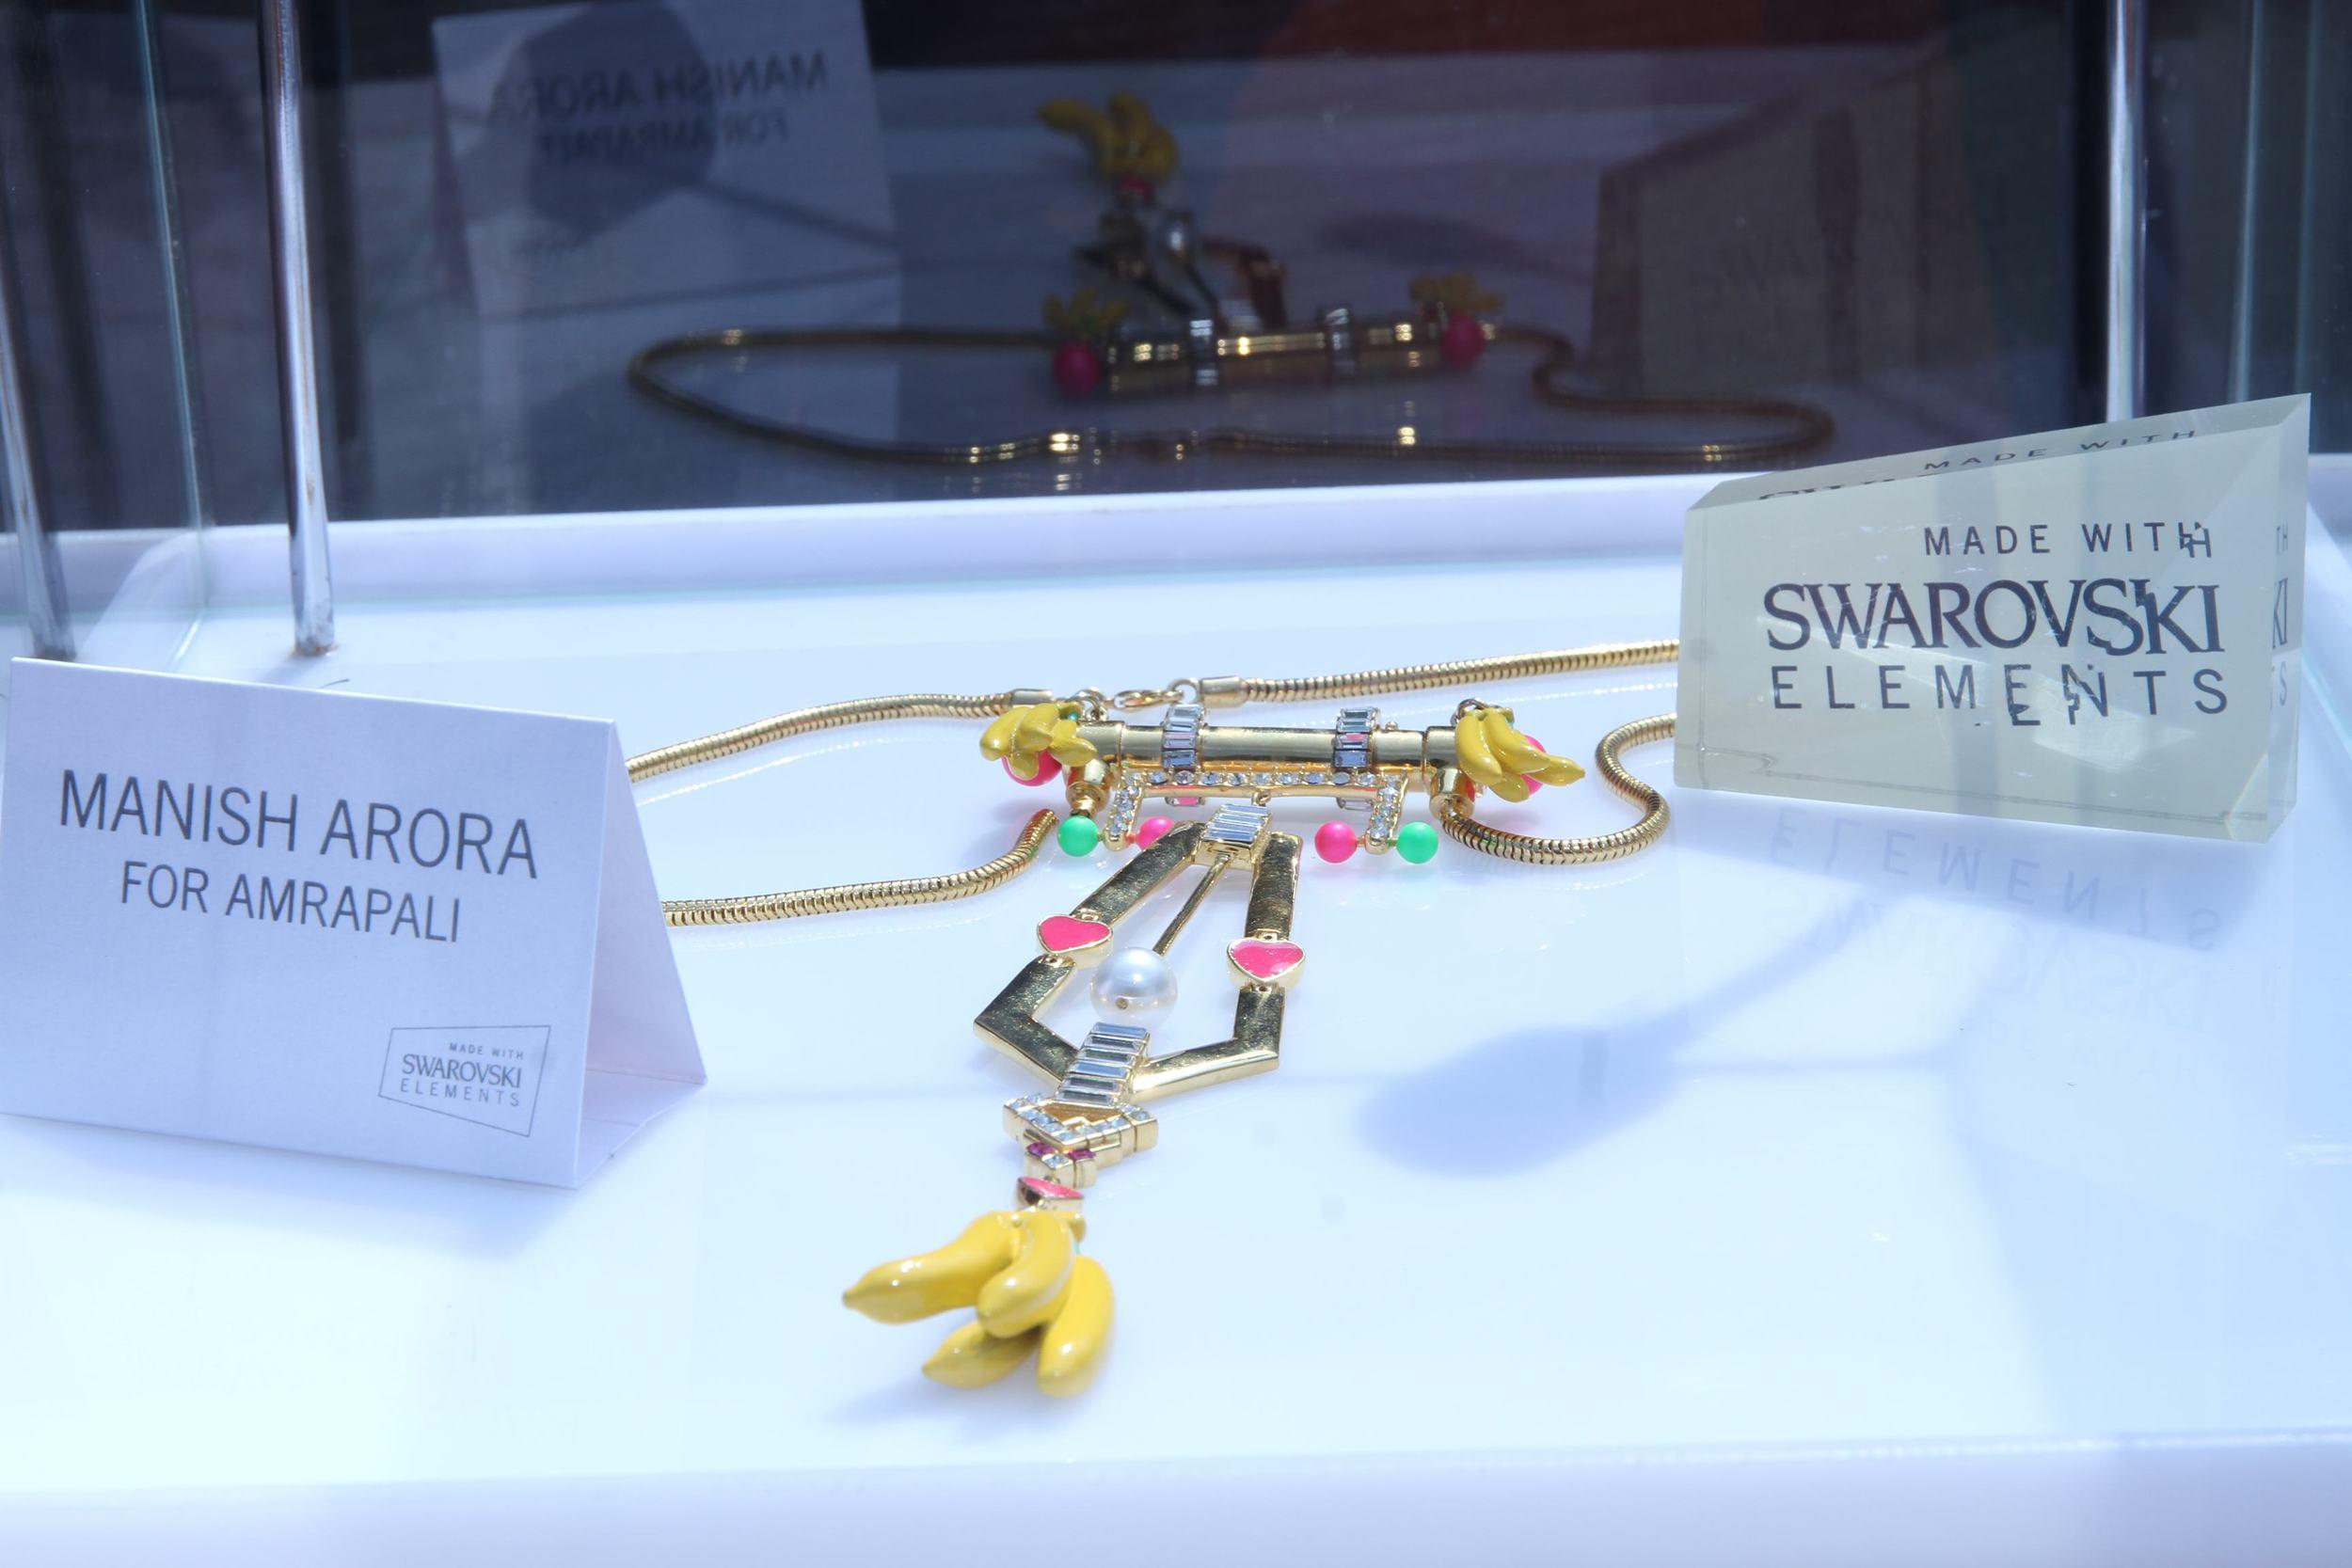 Manish Arora for Amrapali neckpiece made using Swarovski Elements